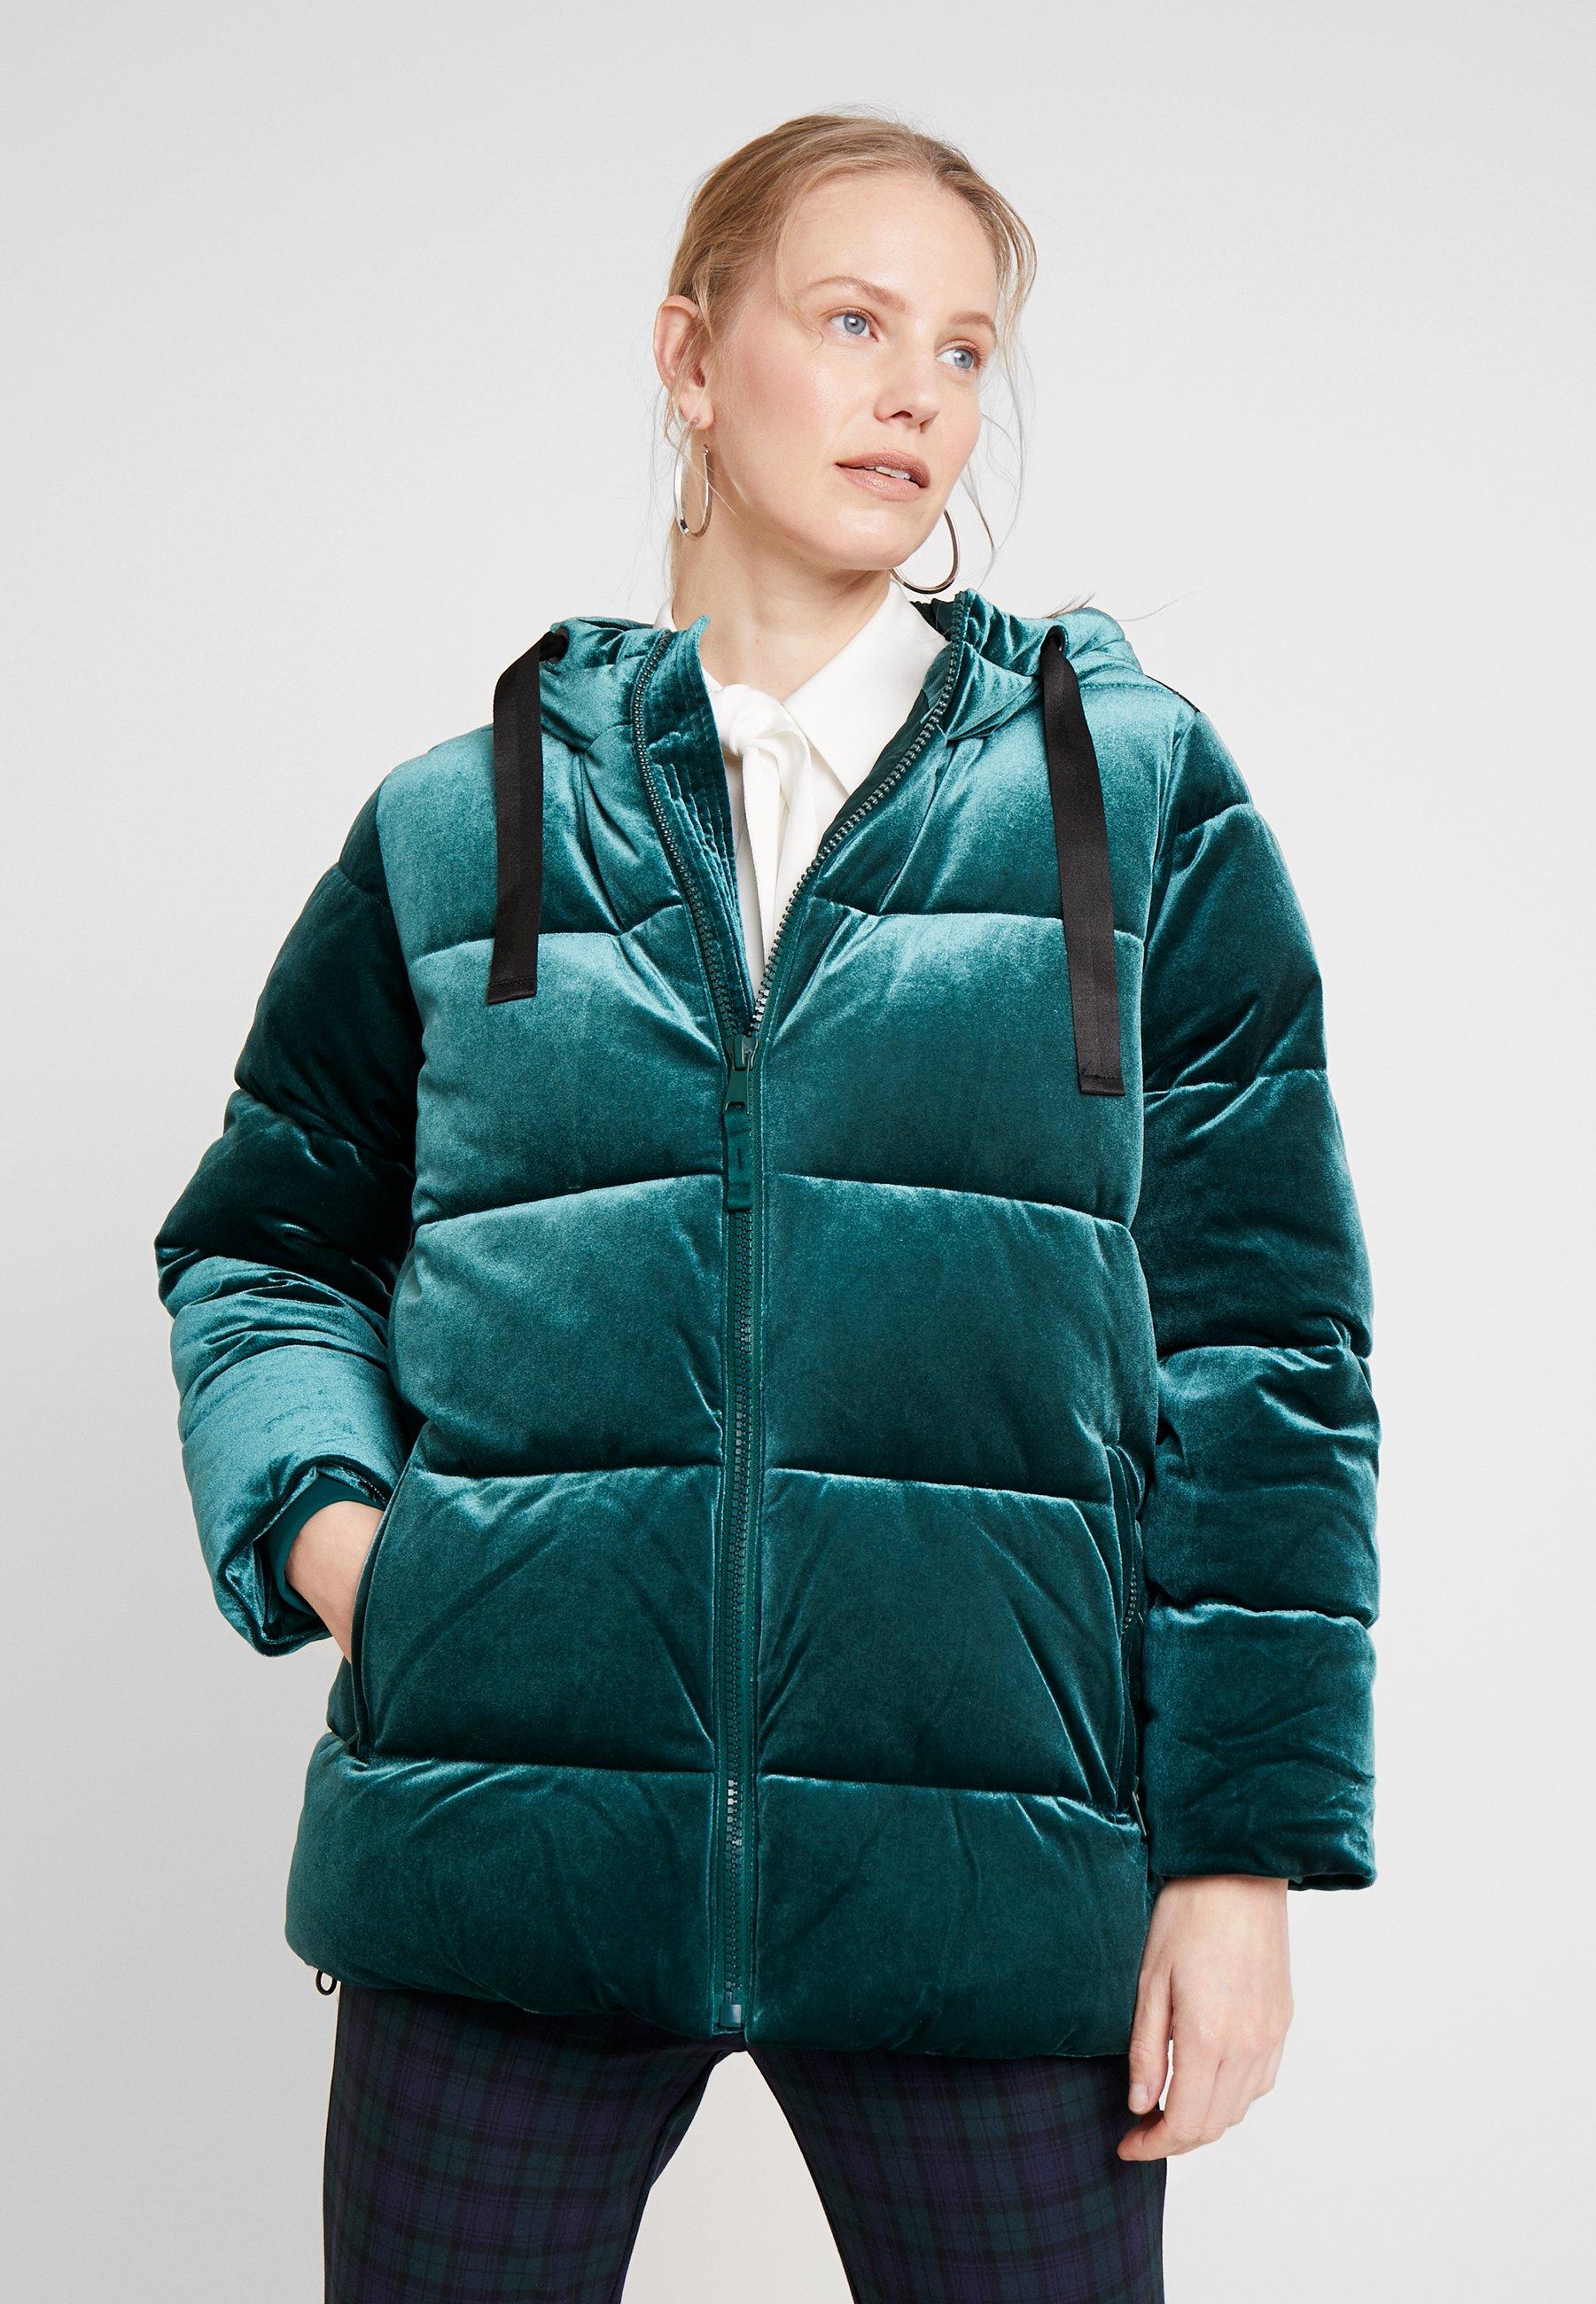 GAP FASHION PUFFER - Veste d'hiver - greenery - Manteaux Femme JXAxU